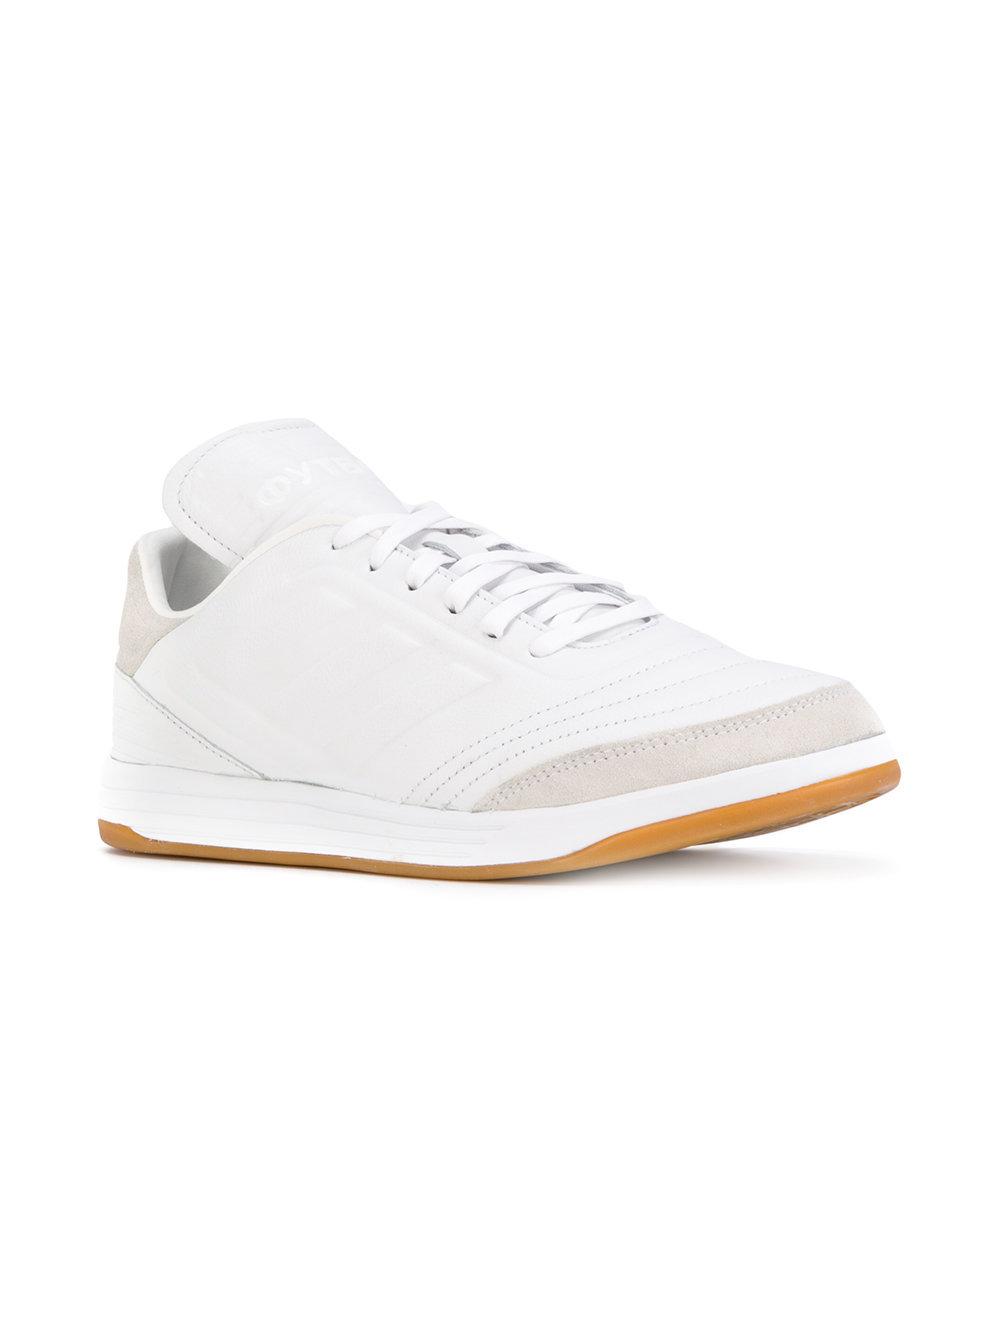 new arrival f8e1e ed1ab Gosha Rubchinskiy X Originals Copa Sneakers